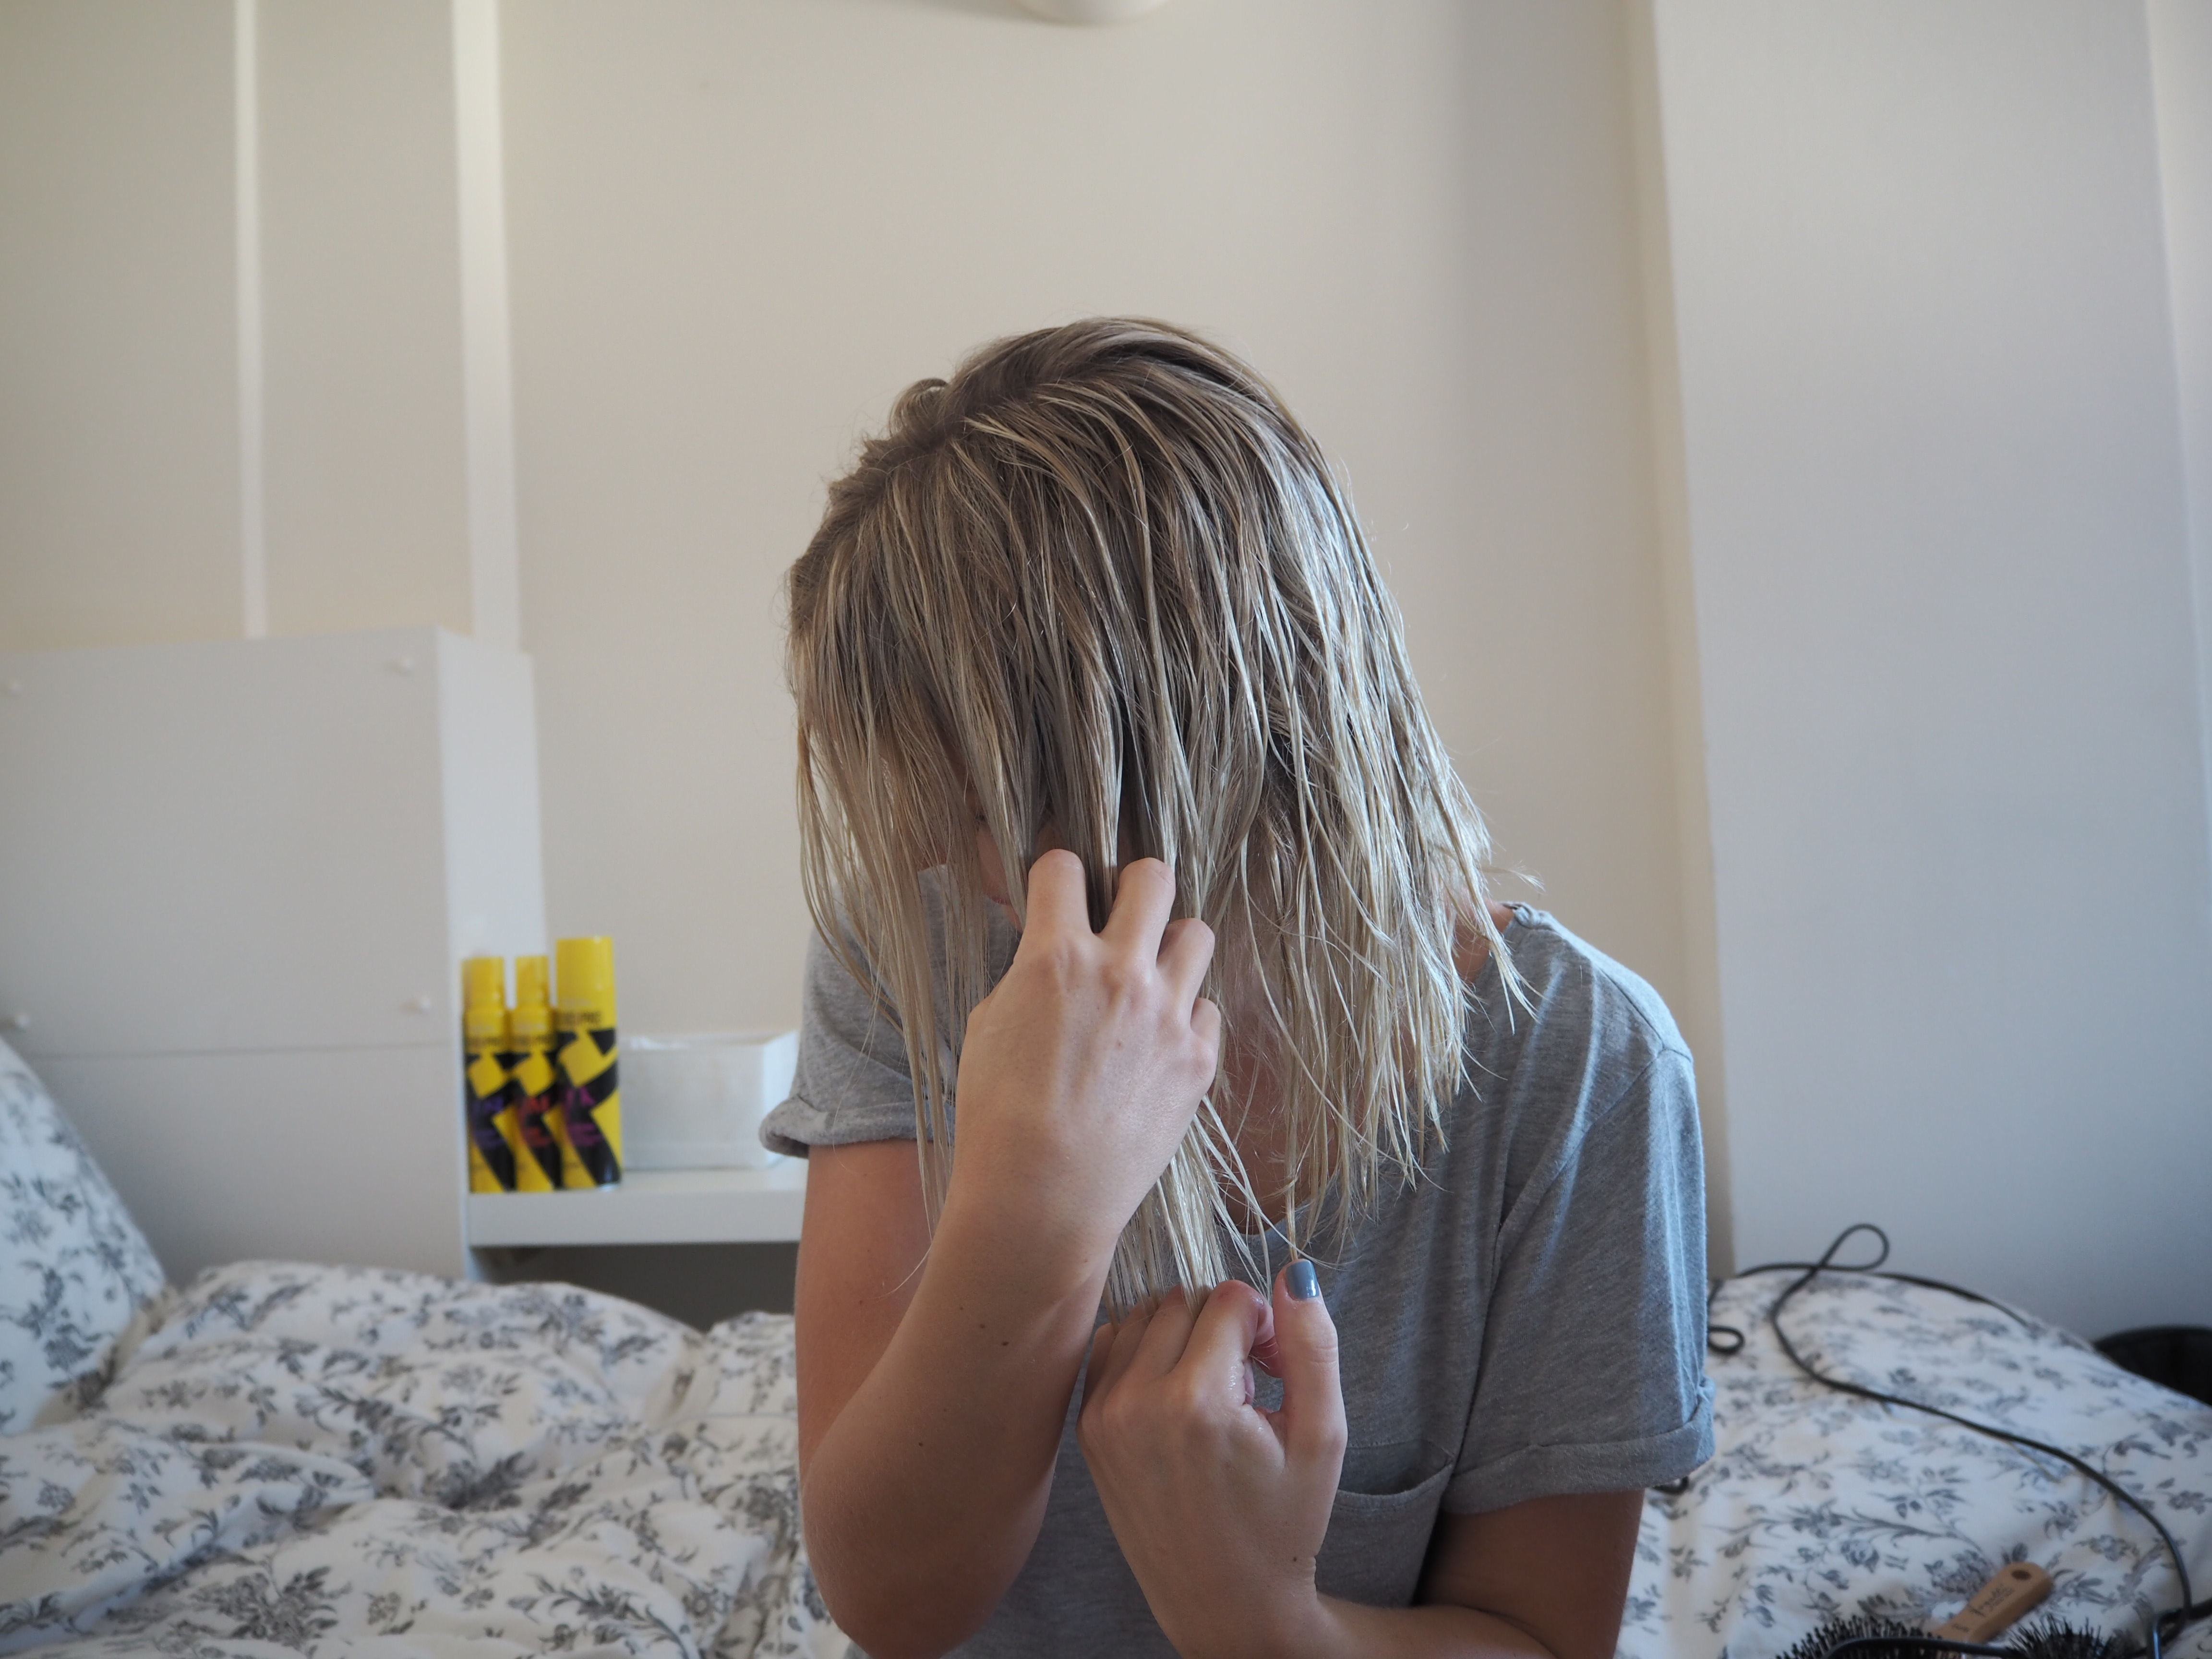 laura byrnes, lauras little locket, wavy hair tutorial, blonde wavy bob, l'oreal studio pro, #whodoyouwanttobetoday